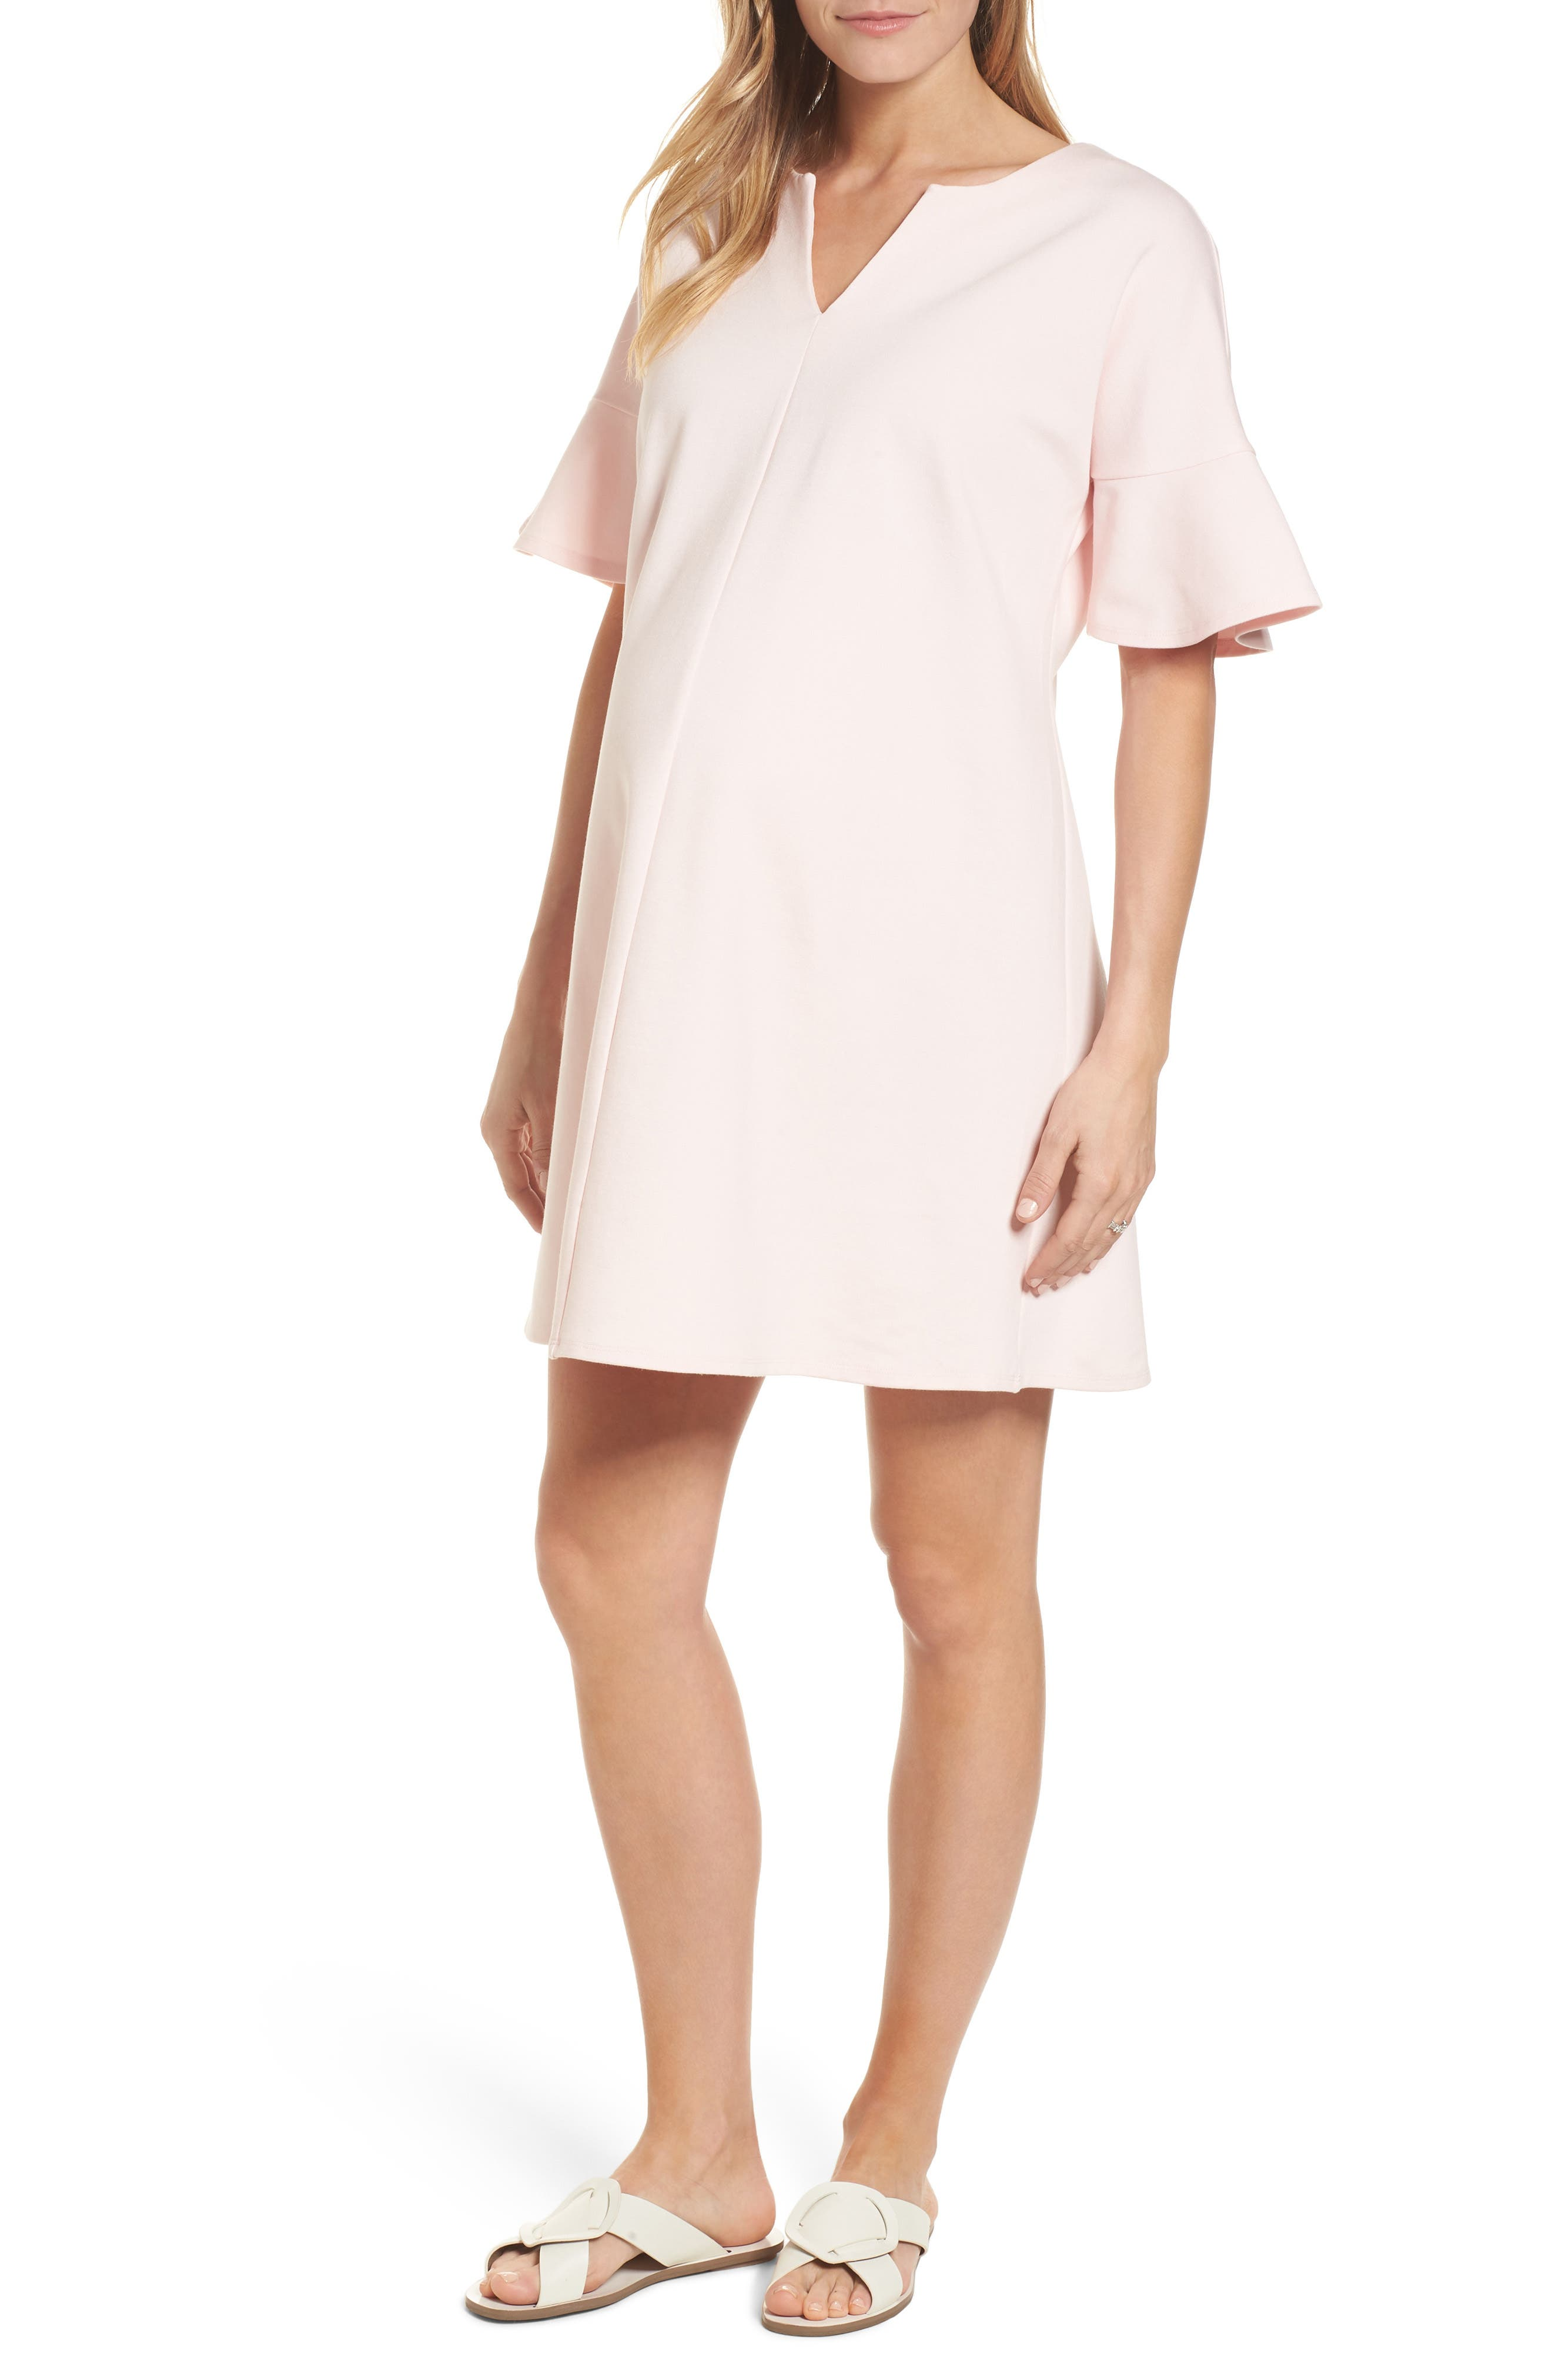 Isabella Oliver Reese Ponte Maternity Dress